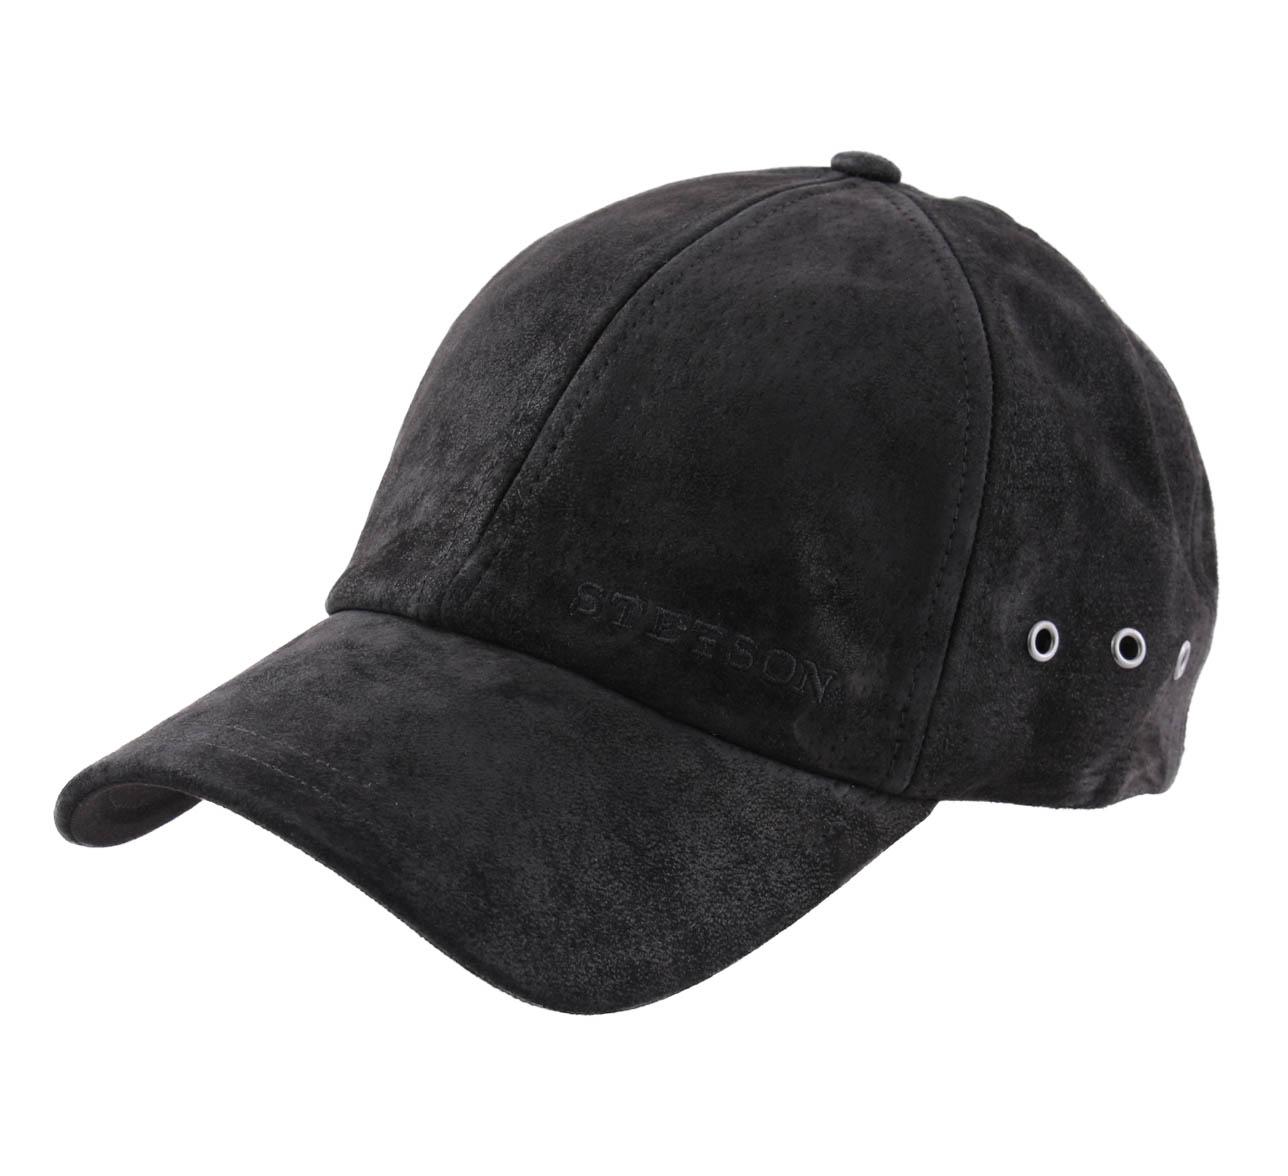 6010945f207 Rawlings Pig Skin - Caps Stetson